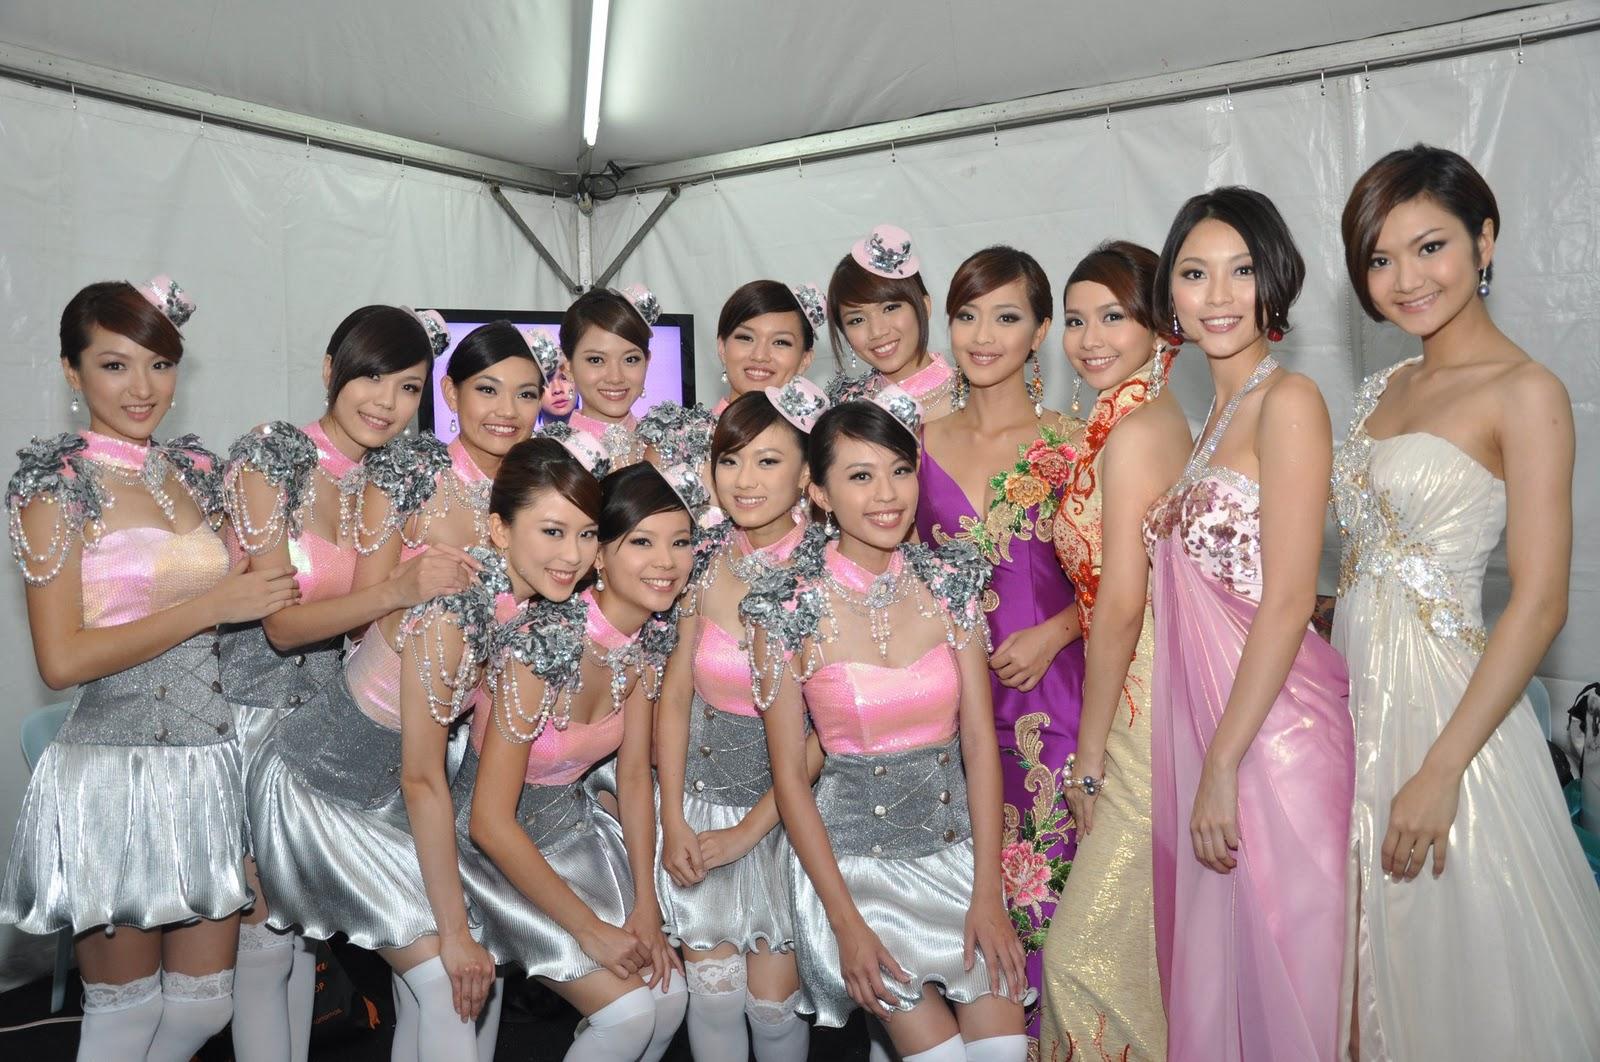 The next miss malaysia international